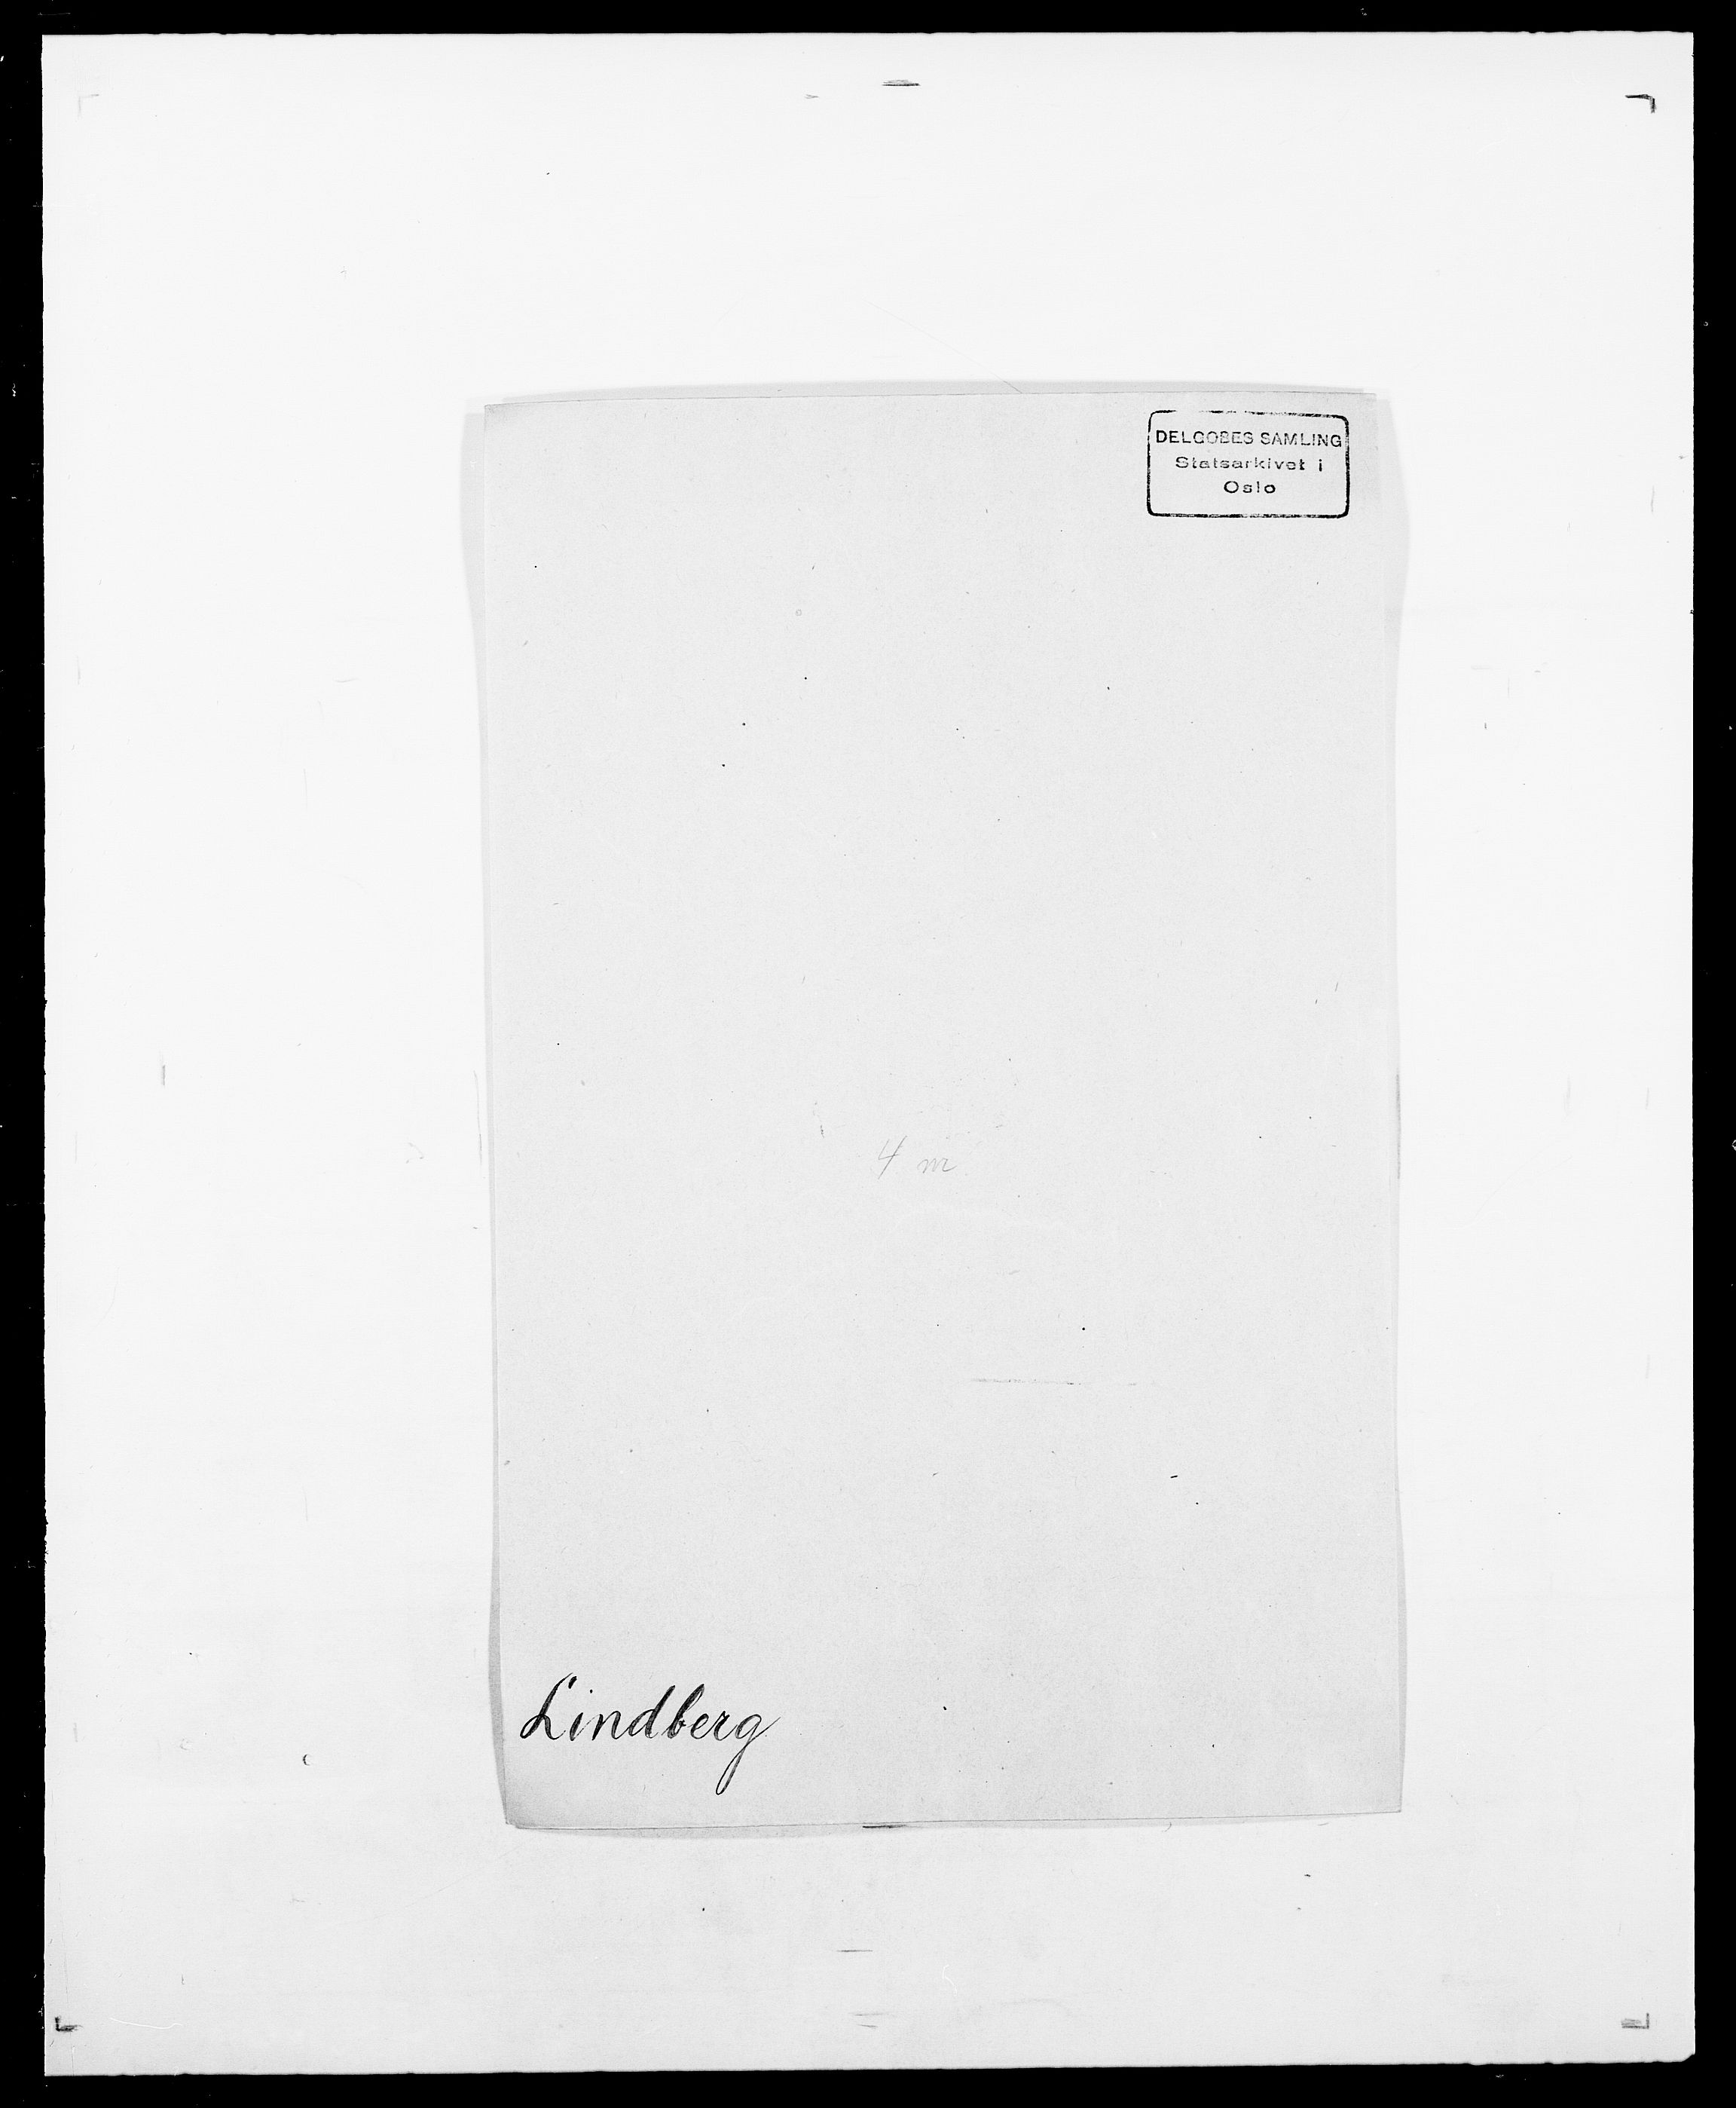 SAO, Delgobe, Charles Antoine - samling, D/Da/L0023: Lau - Lirvyn, s. 561